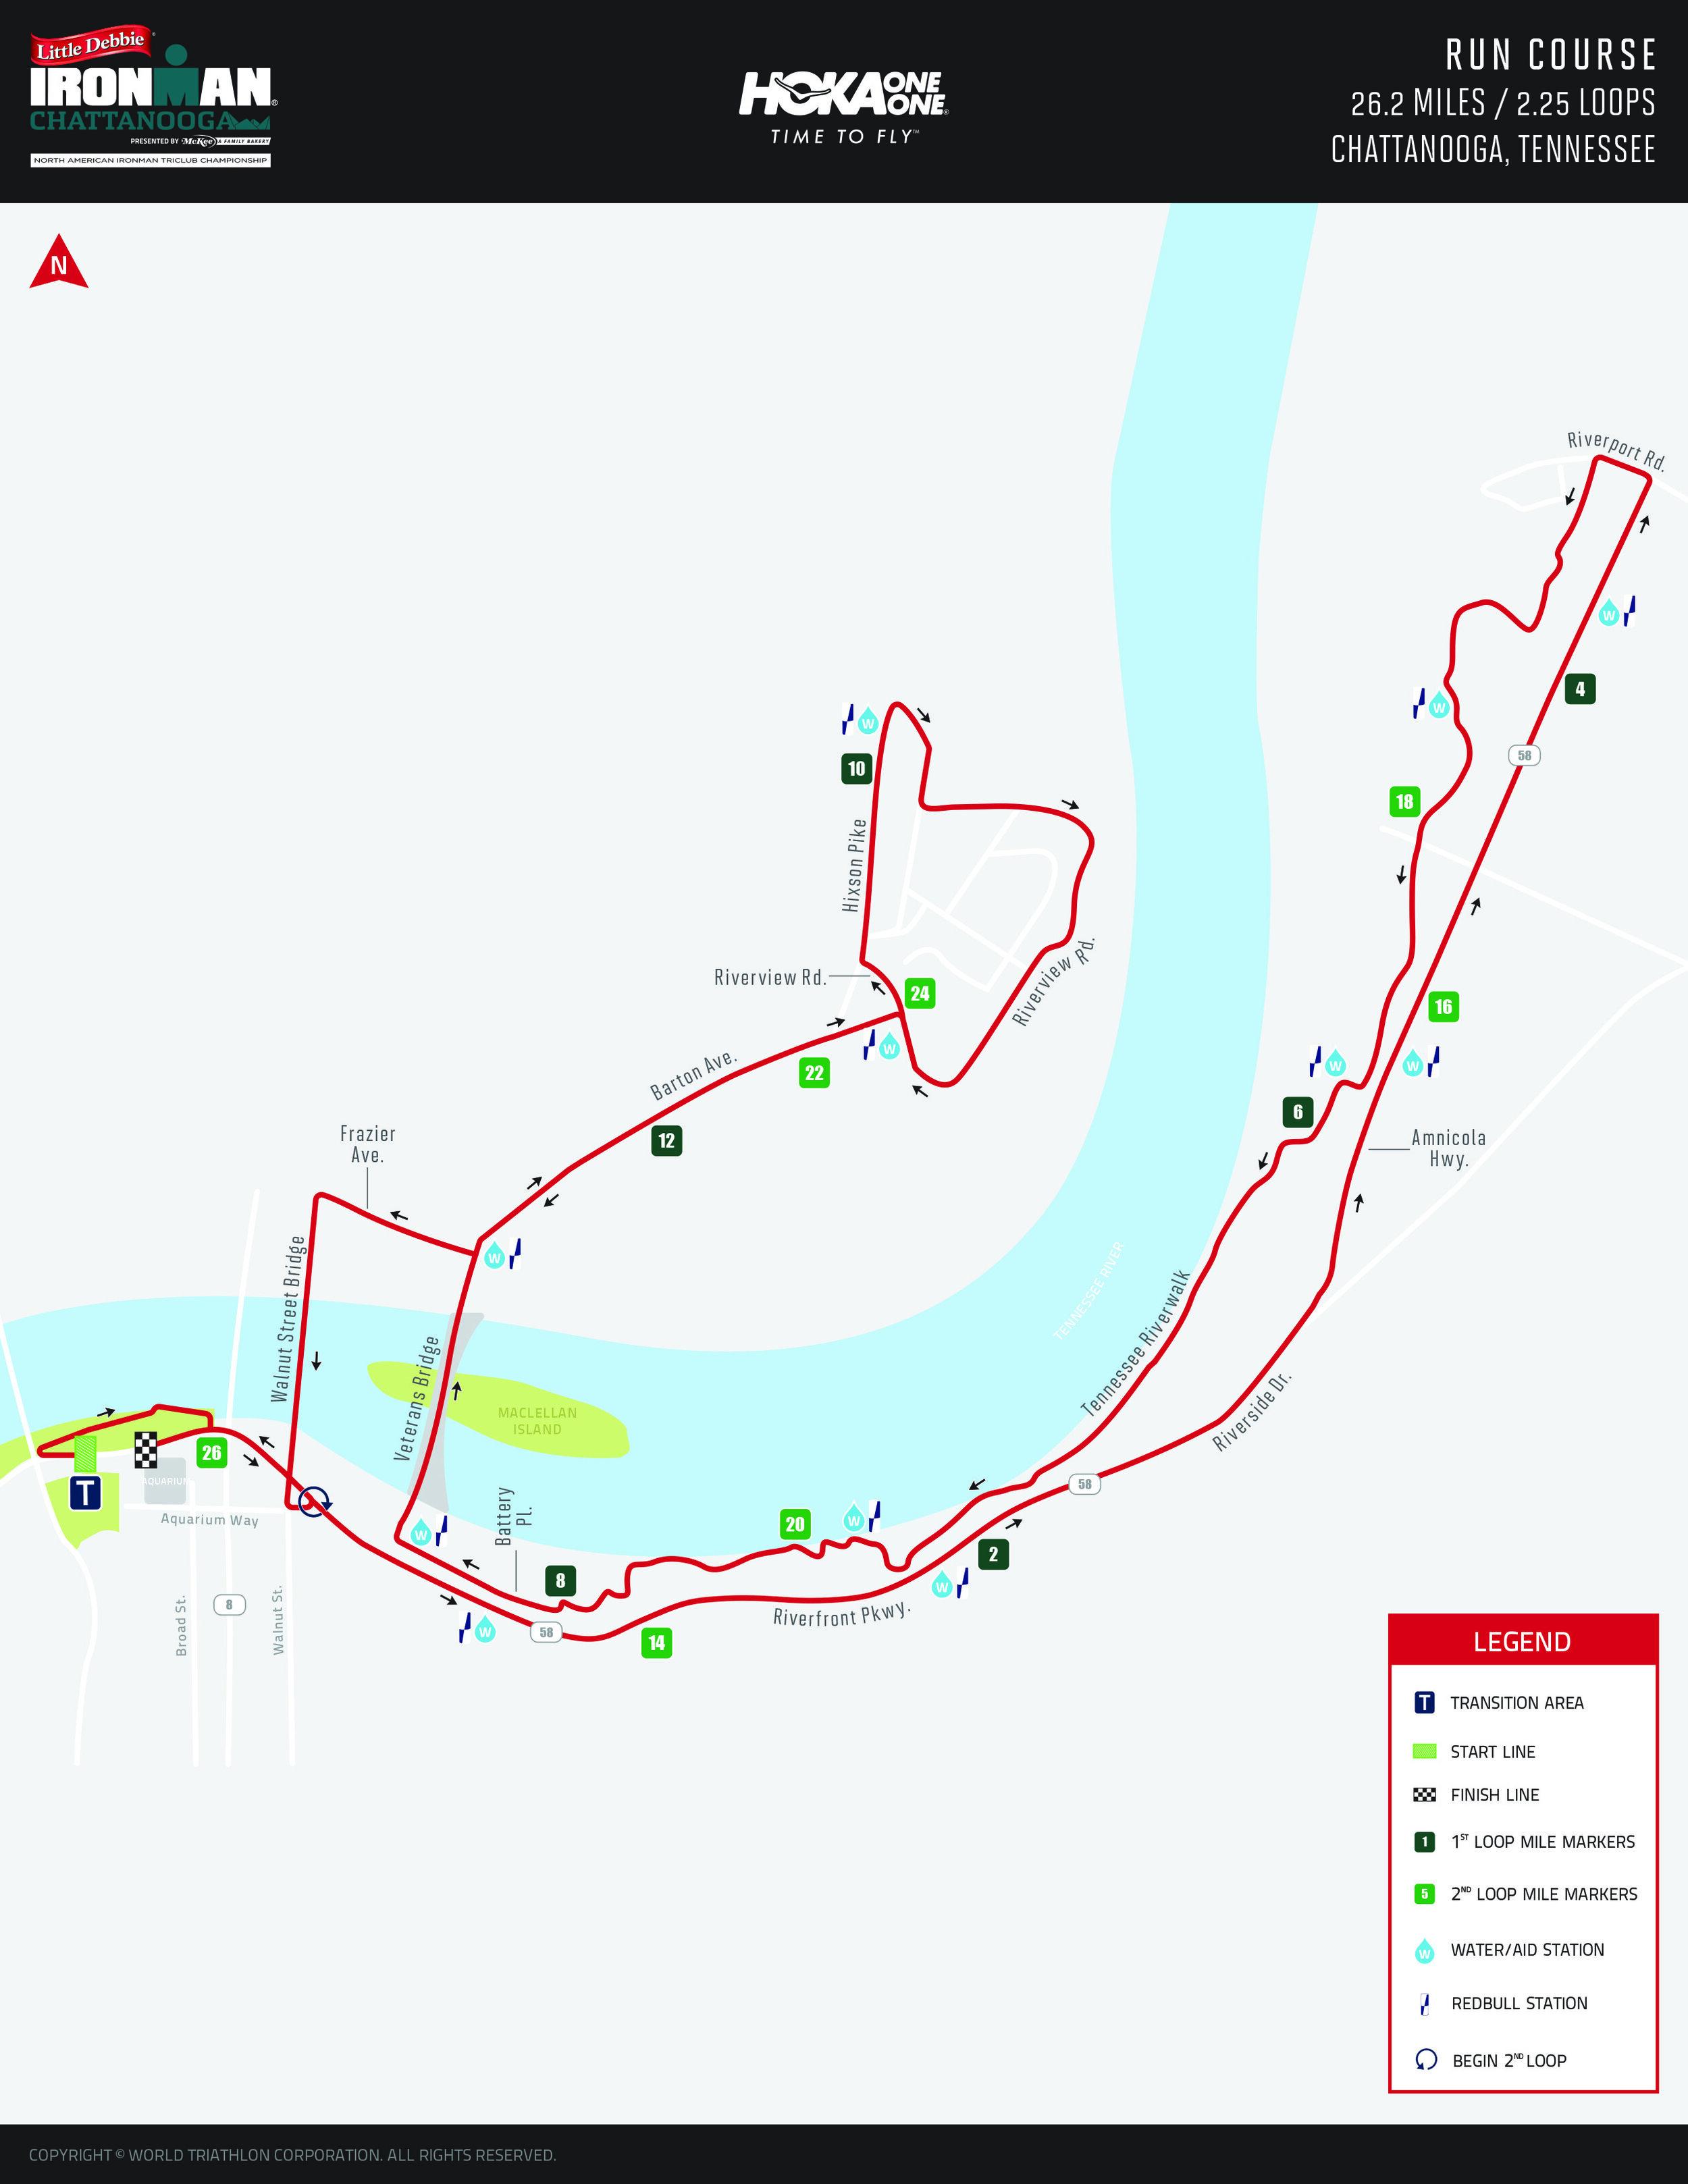 RUNim chattanooga19 coursemap run 9319 cc web-1.jpg